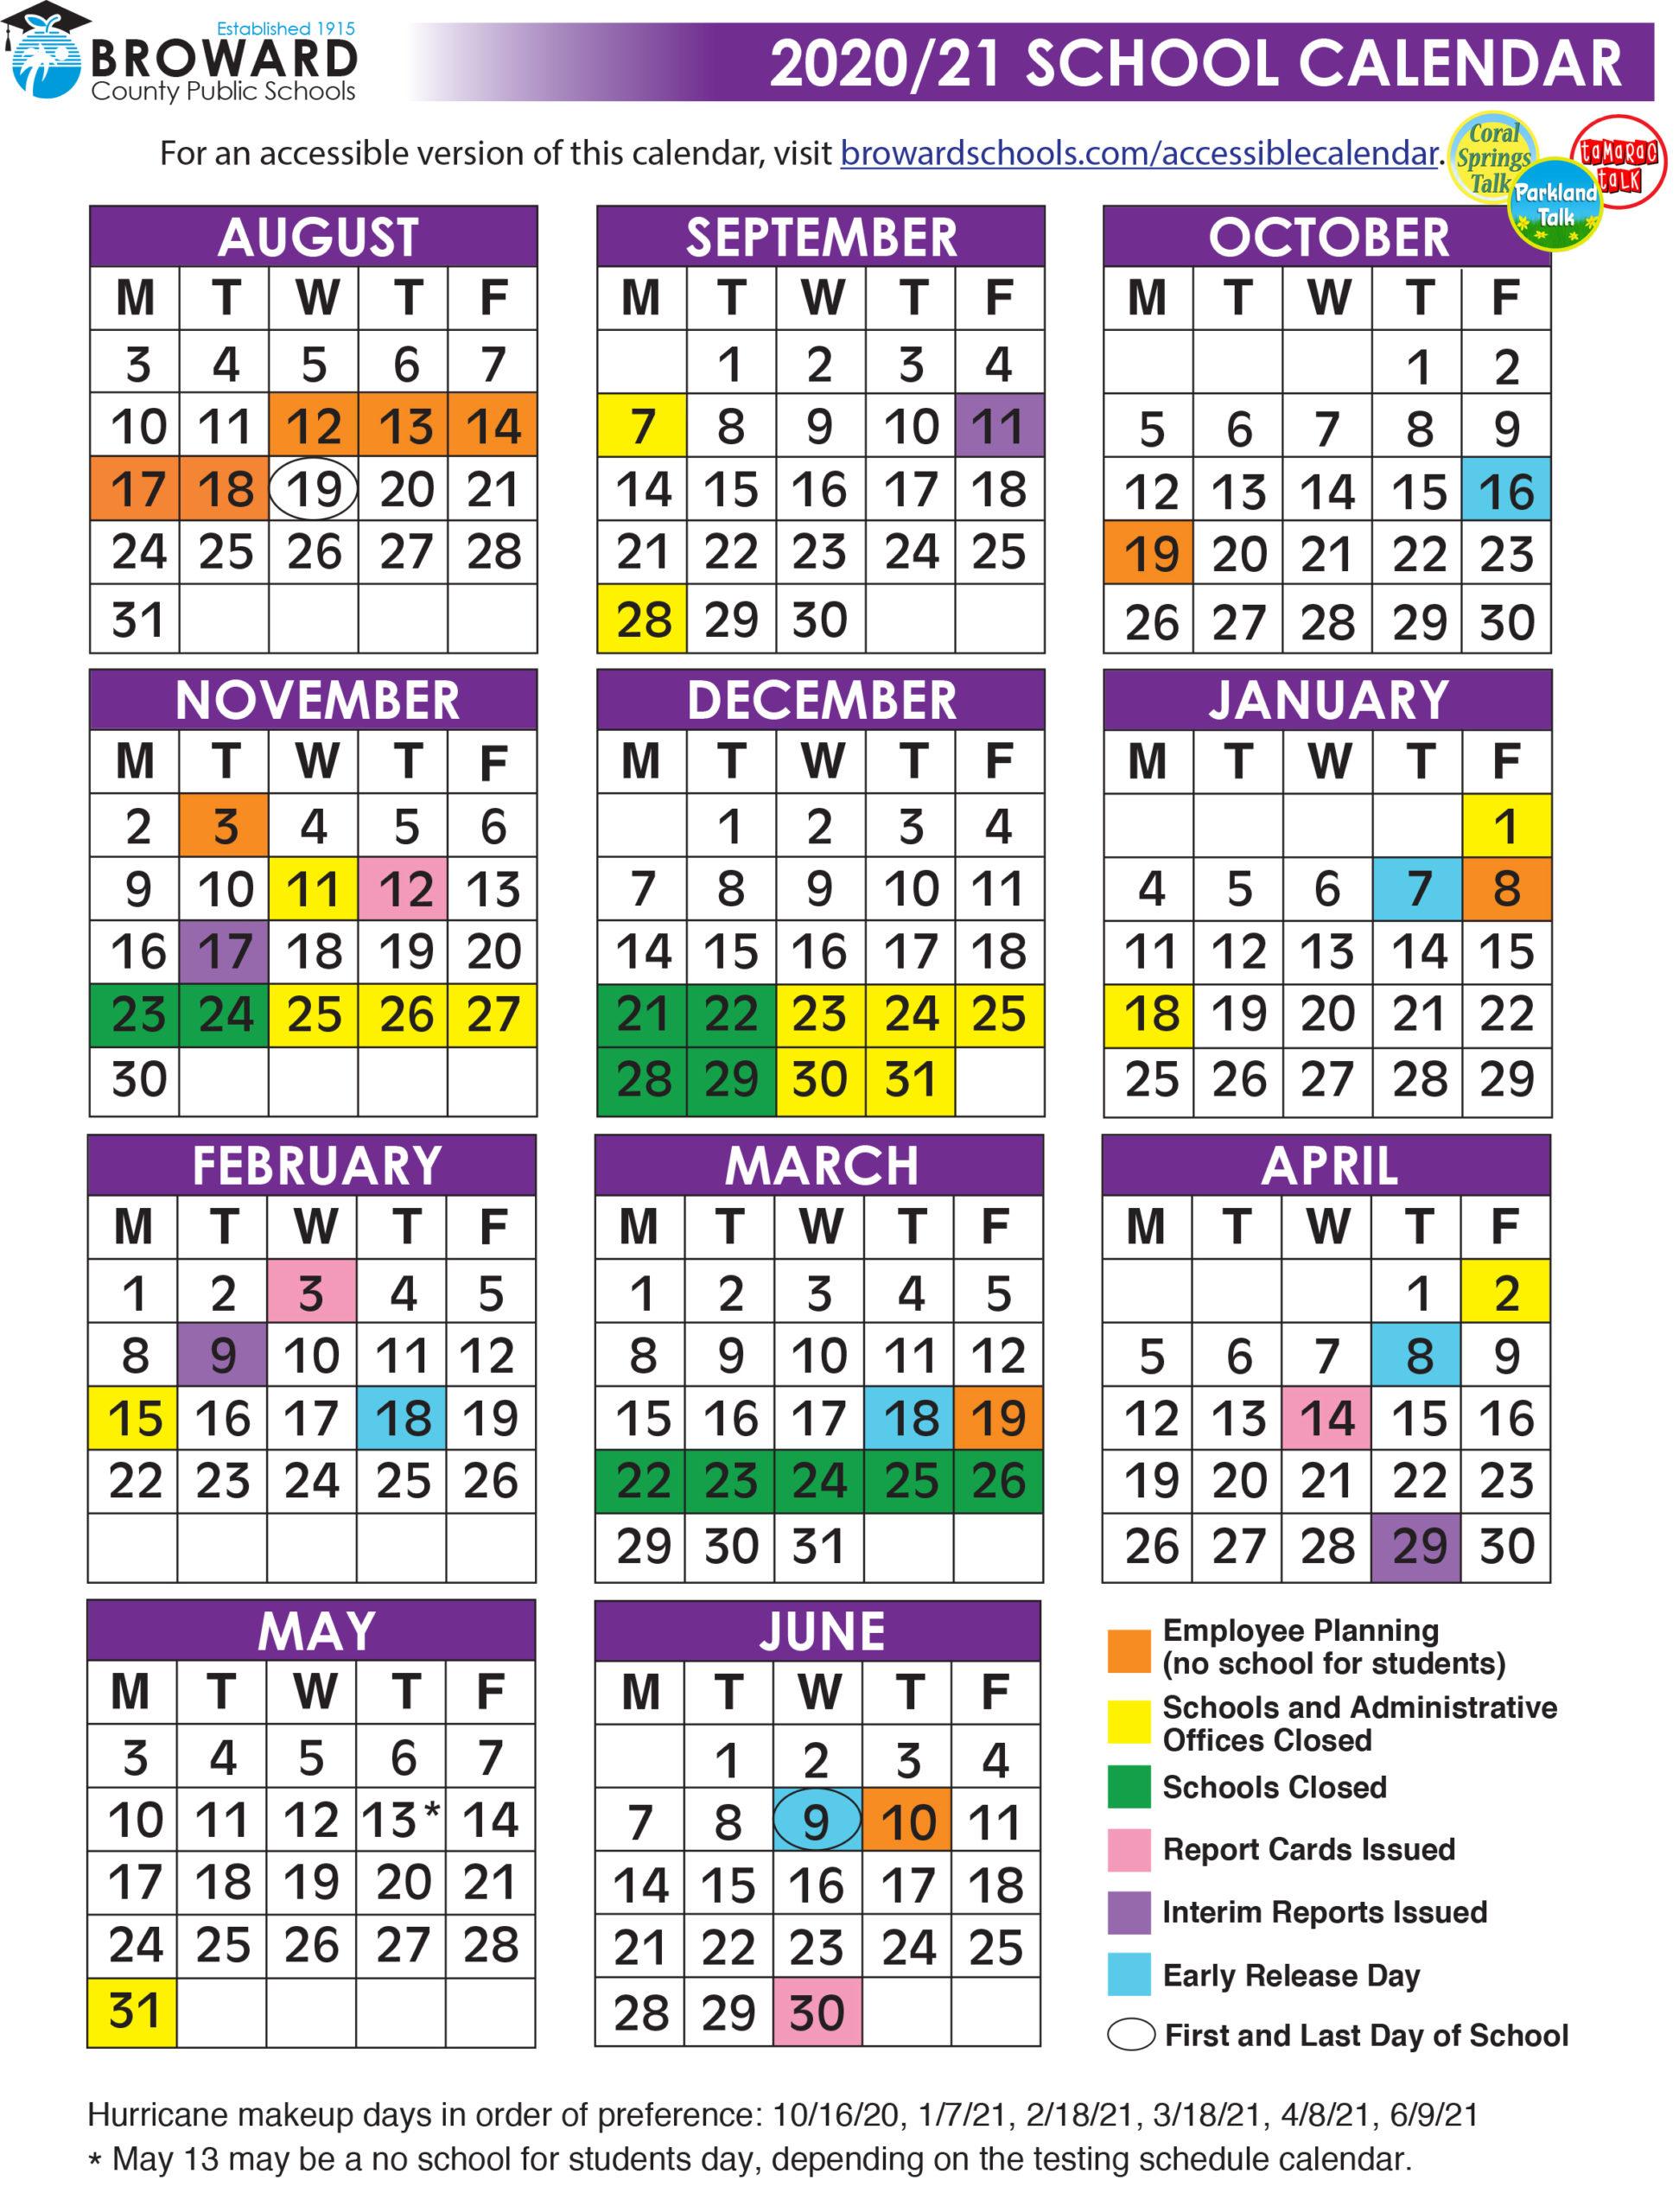 Official 2020/21 Broward County Public Schools Color For Port St Lucie School District Calendar